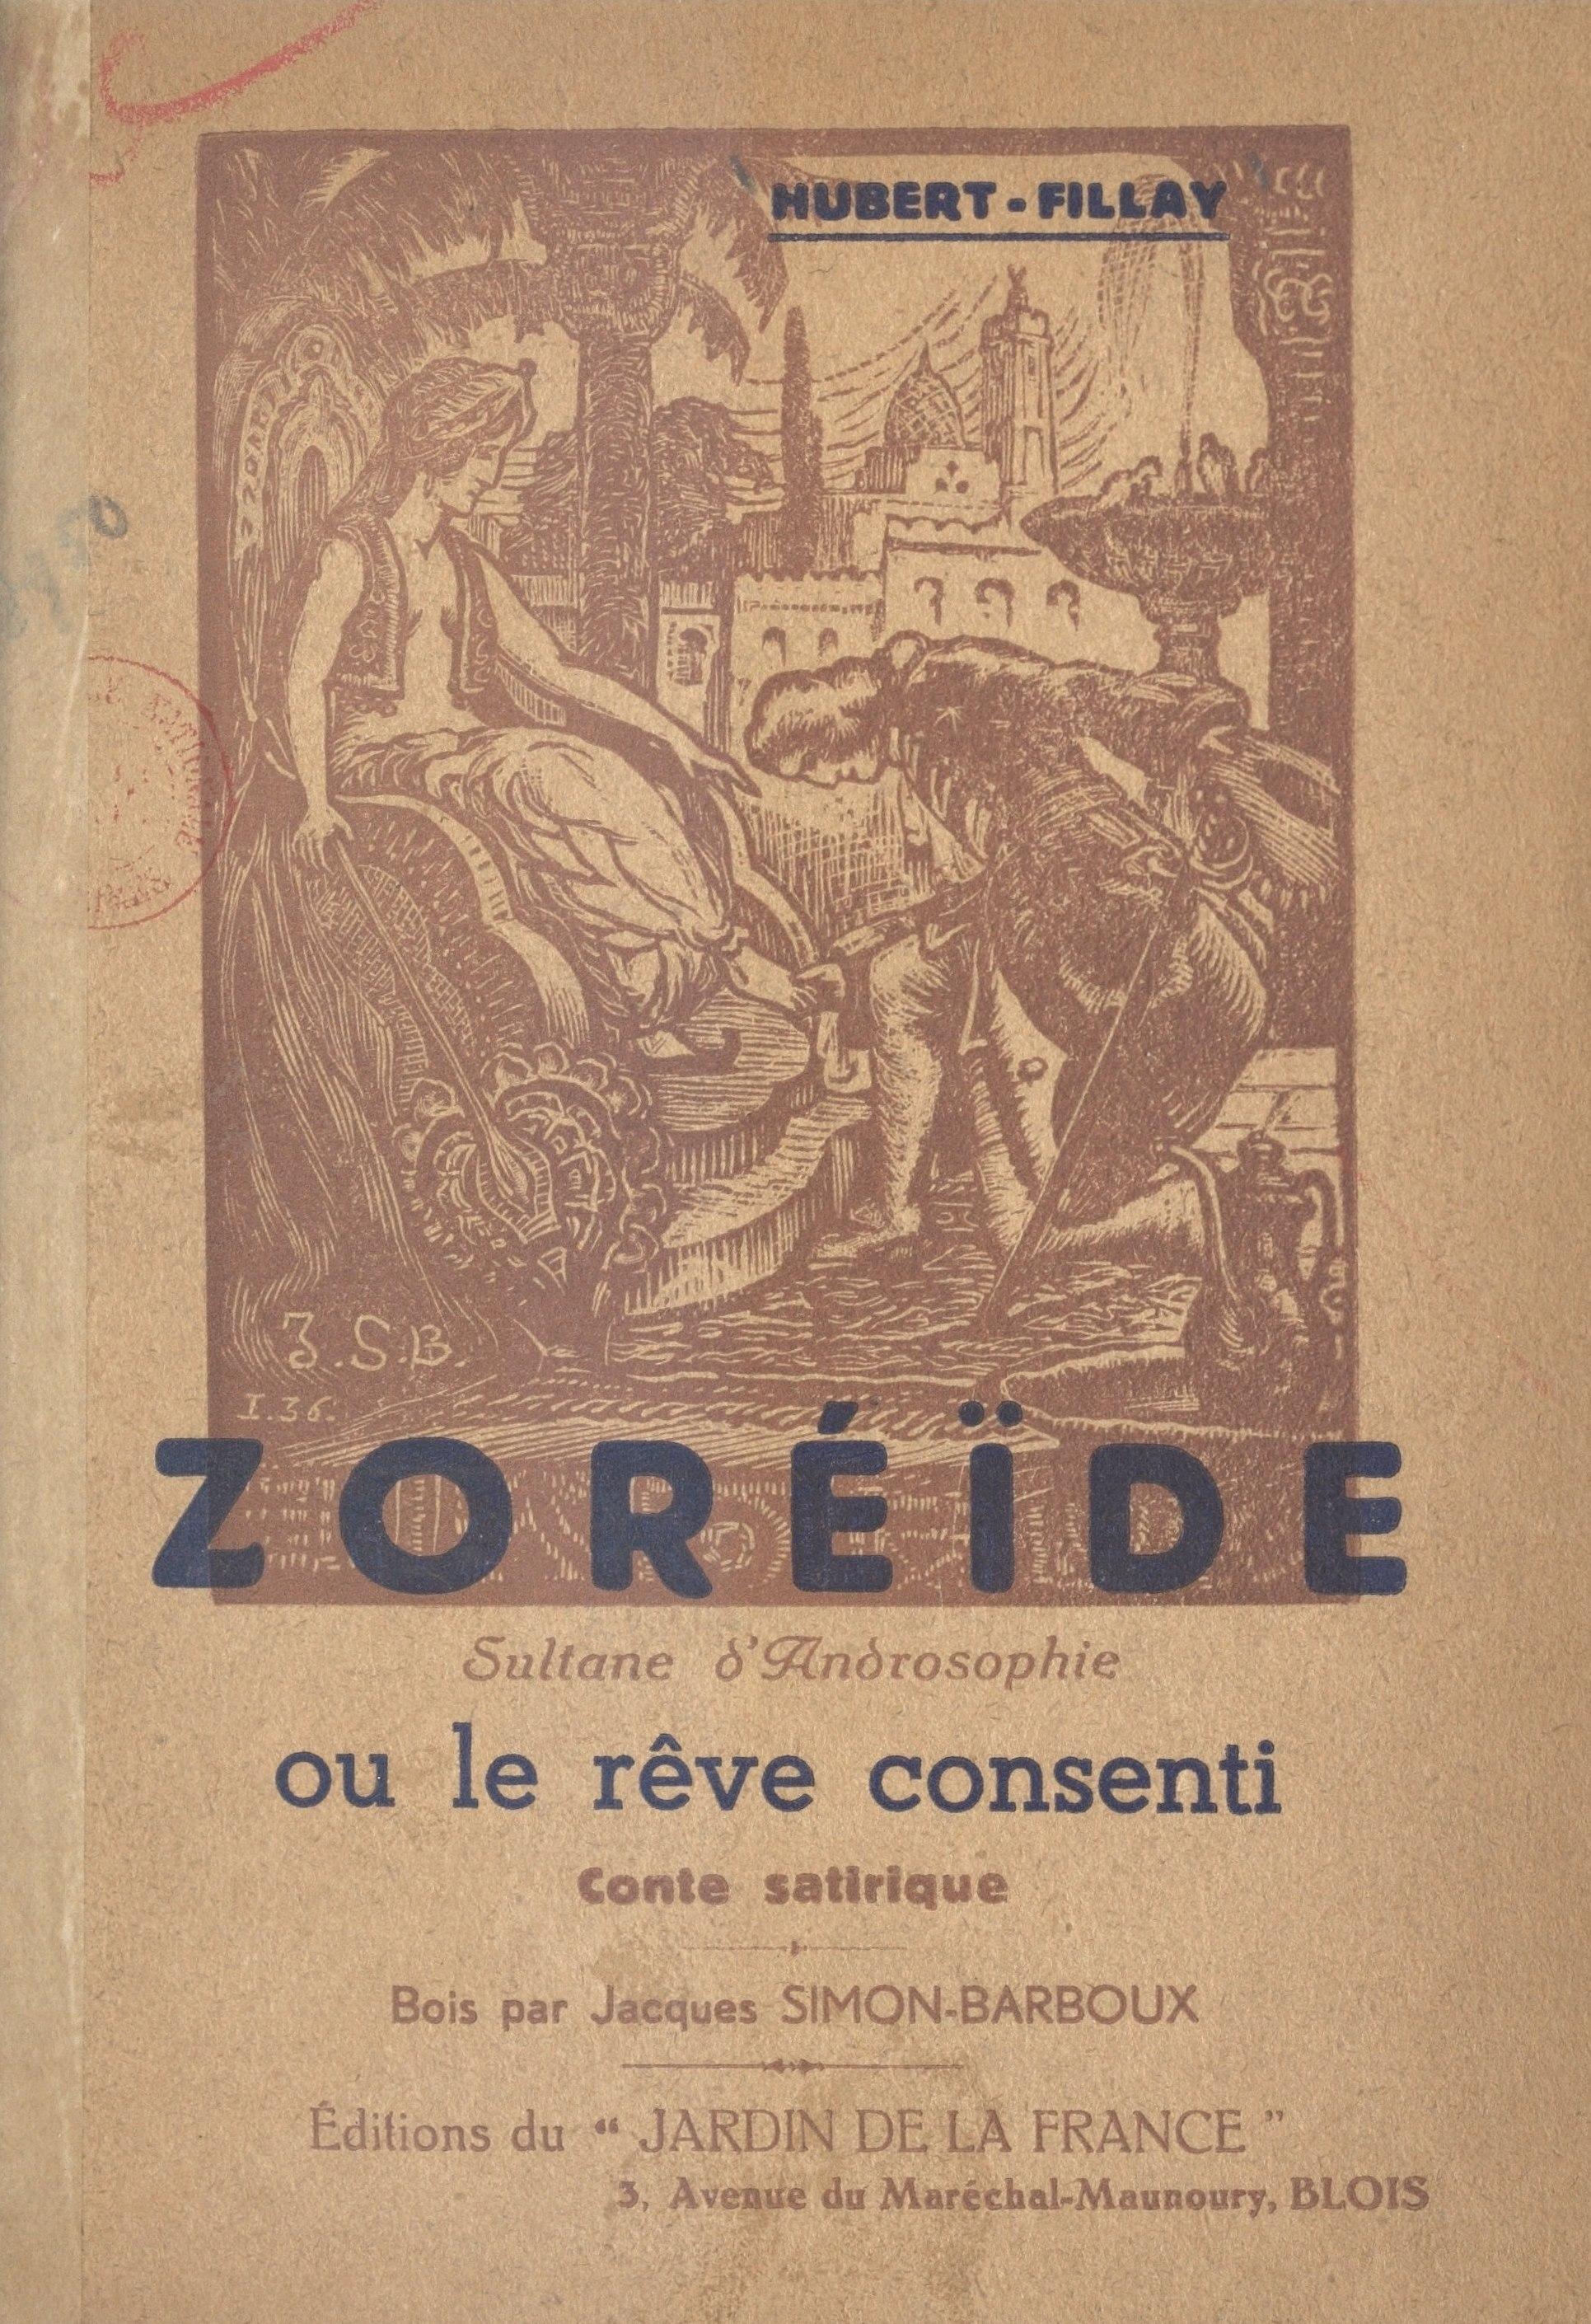 Zoréïde, sultane d'Androsophie, OU LE RÊVE CONSENTI